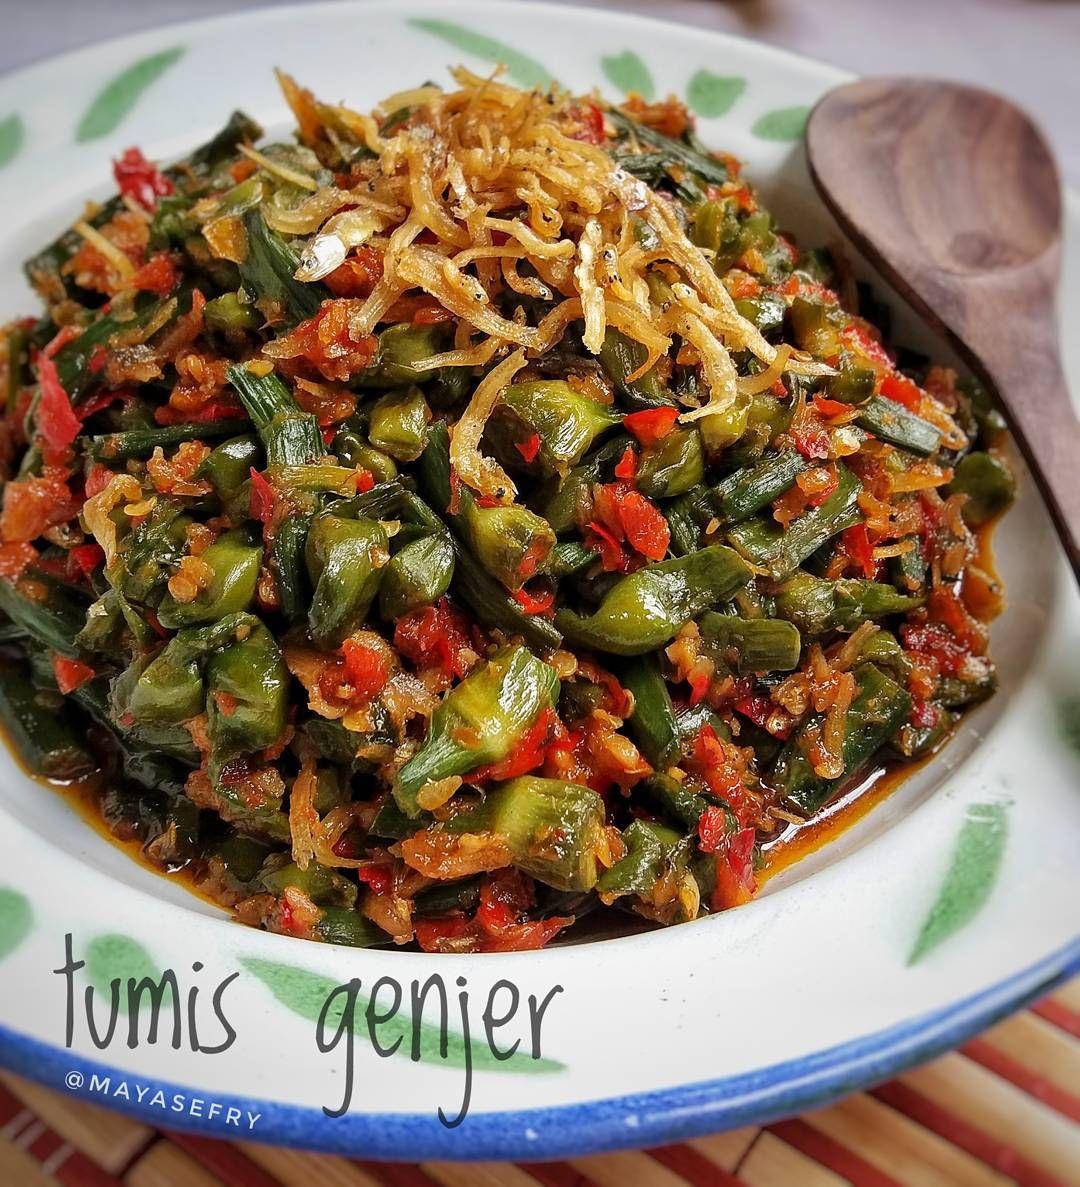 Resep Masakan Nusantara Tumis Genjer Food Cooking Cooking Recipes